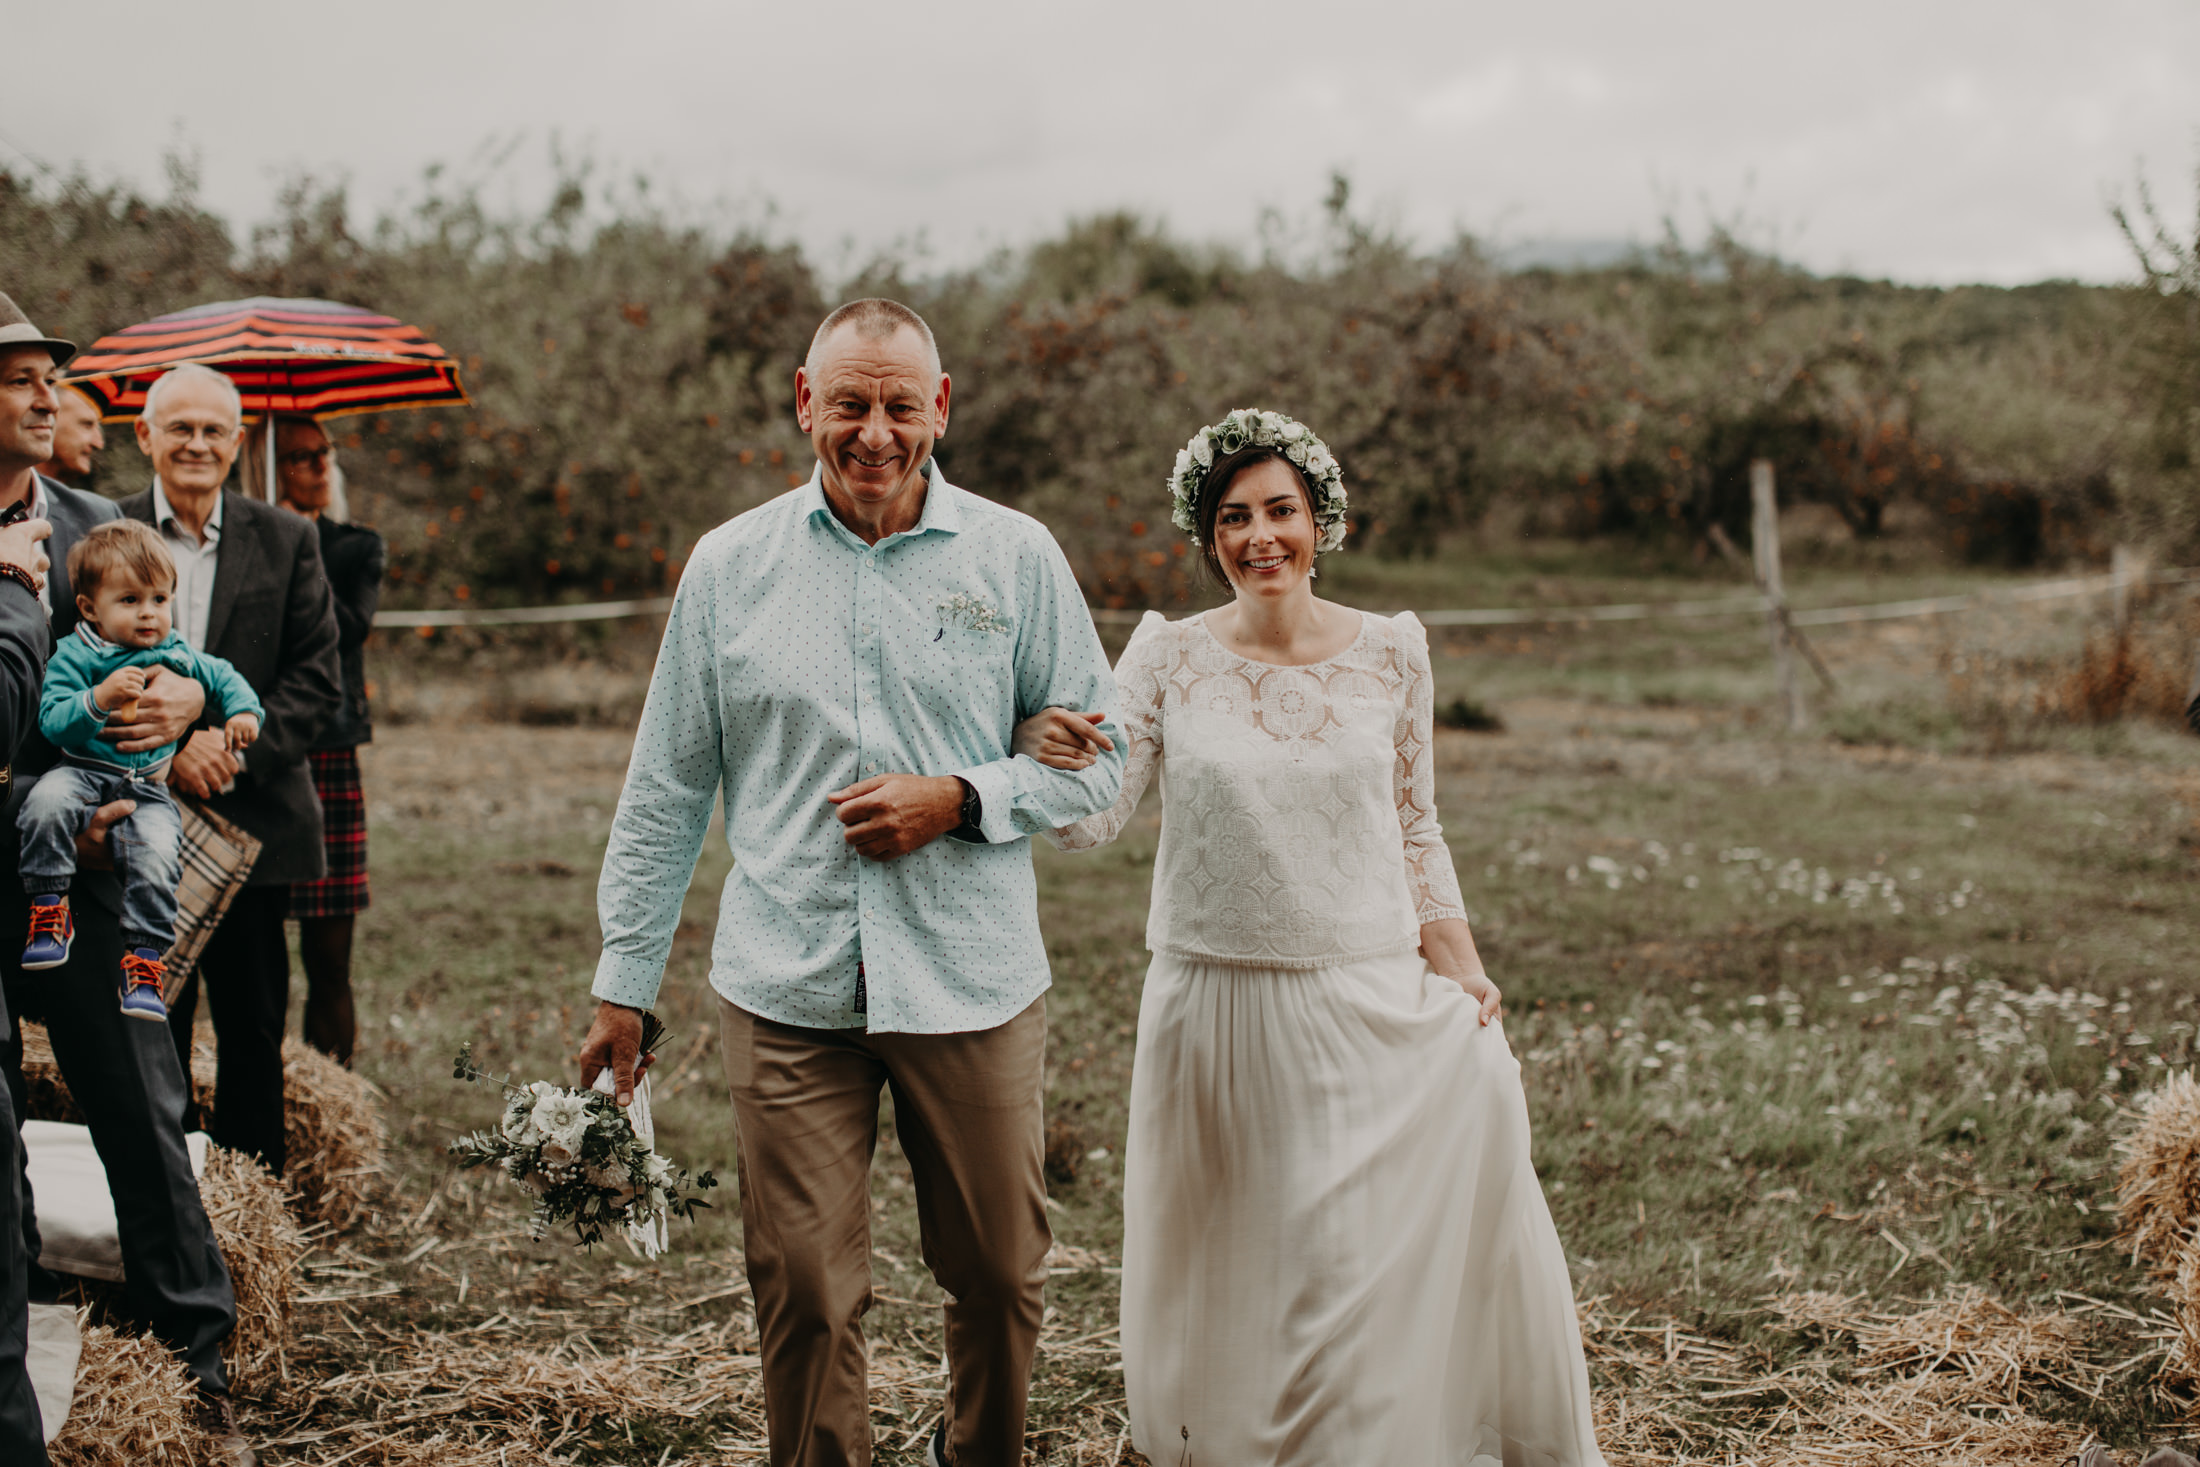 Mariage alsace germany wedding kid-37.jpg